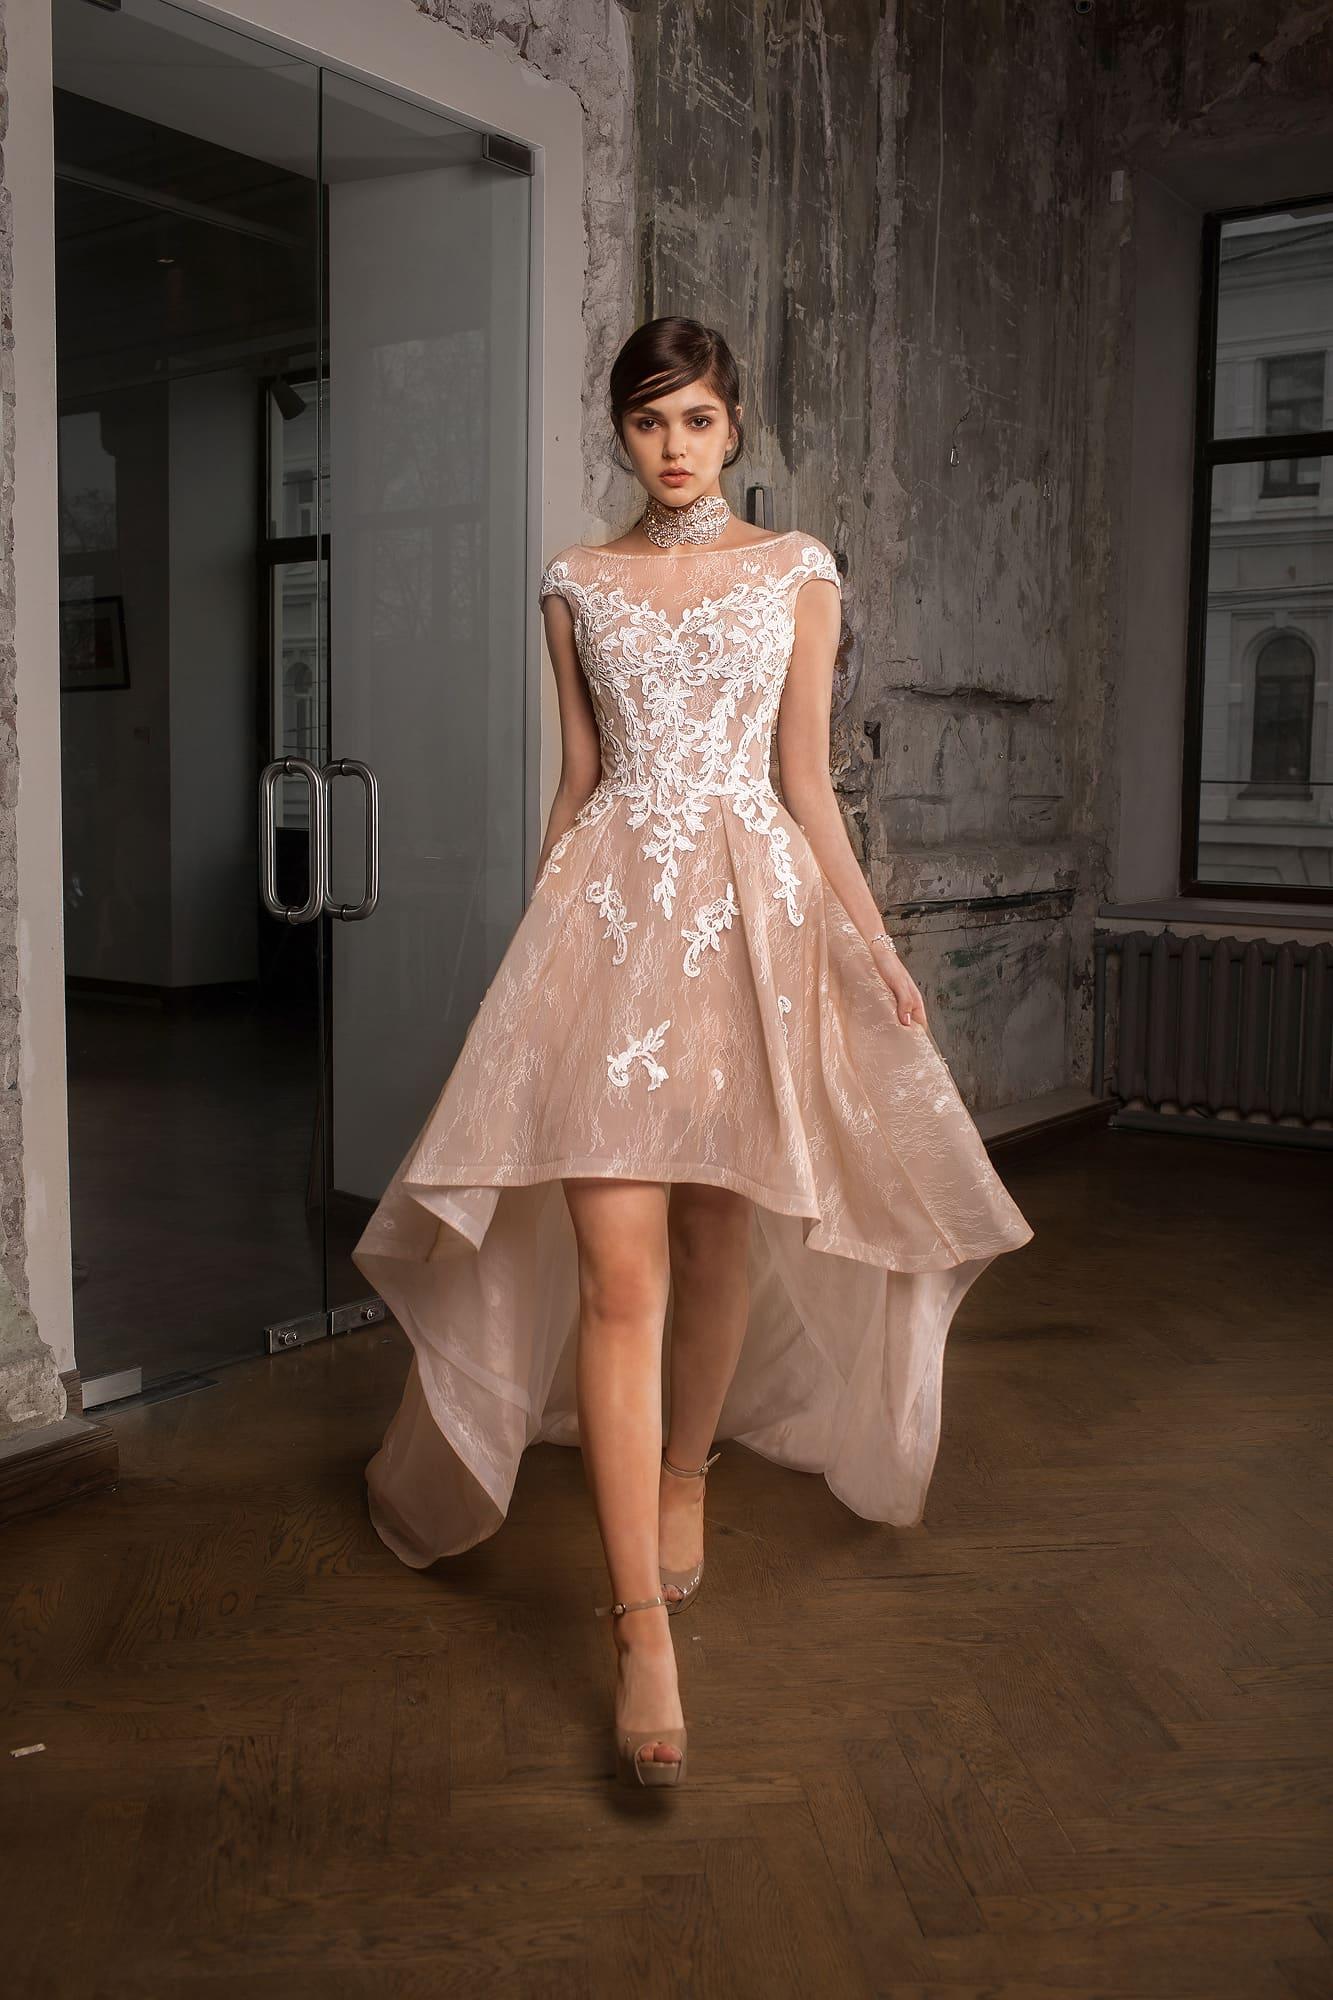 b4759403707 Эффектное короткое свадебное платье Natalia Romanova Зара со шлейфом ...